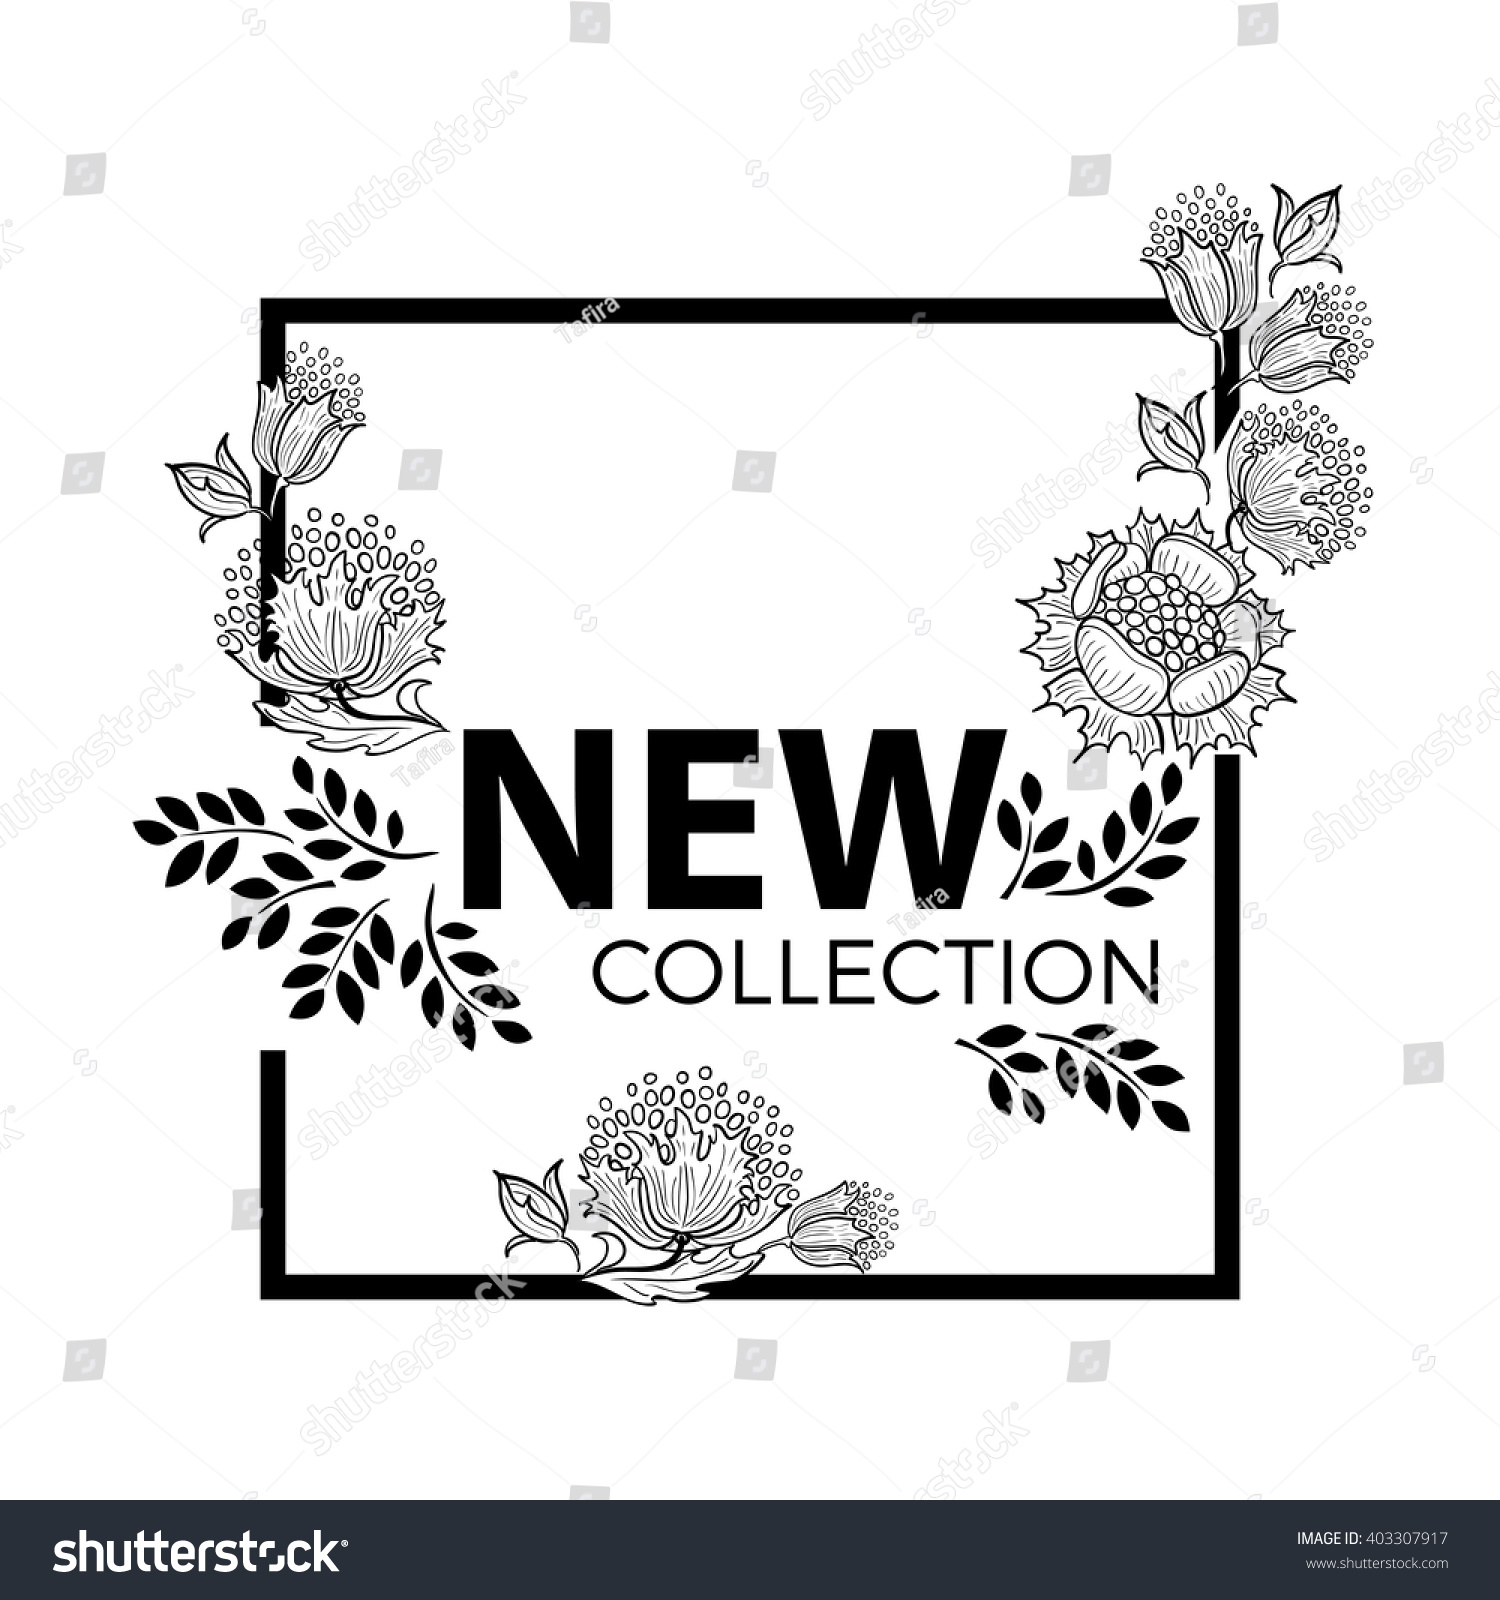 New Collection Fashion Graphic Design Square Stock Vector